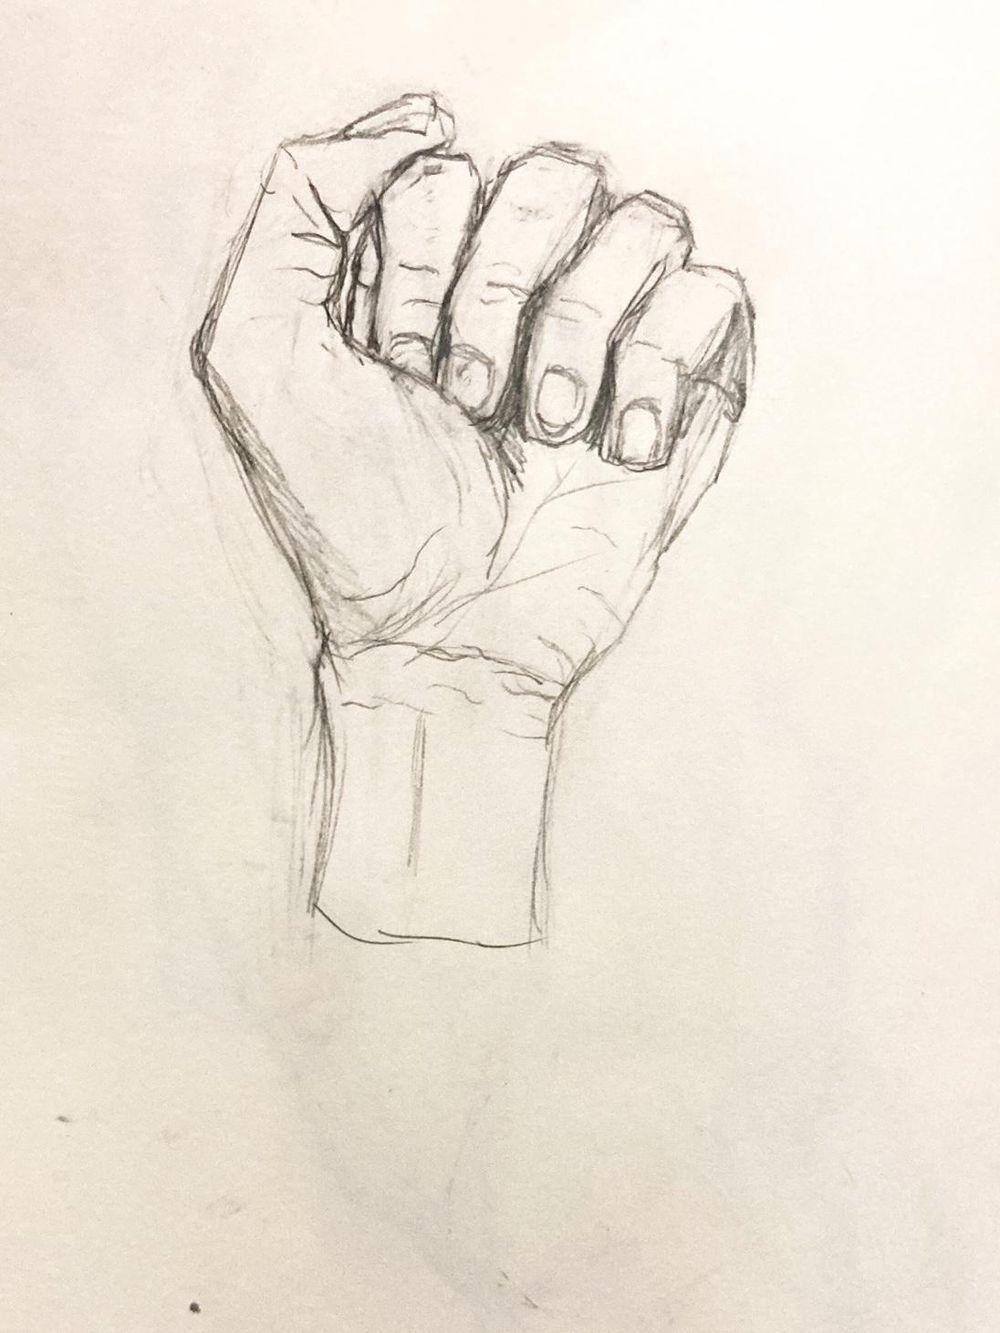 hands, hands, hands - image 3 - student project